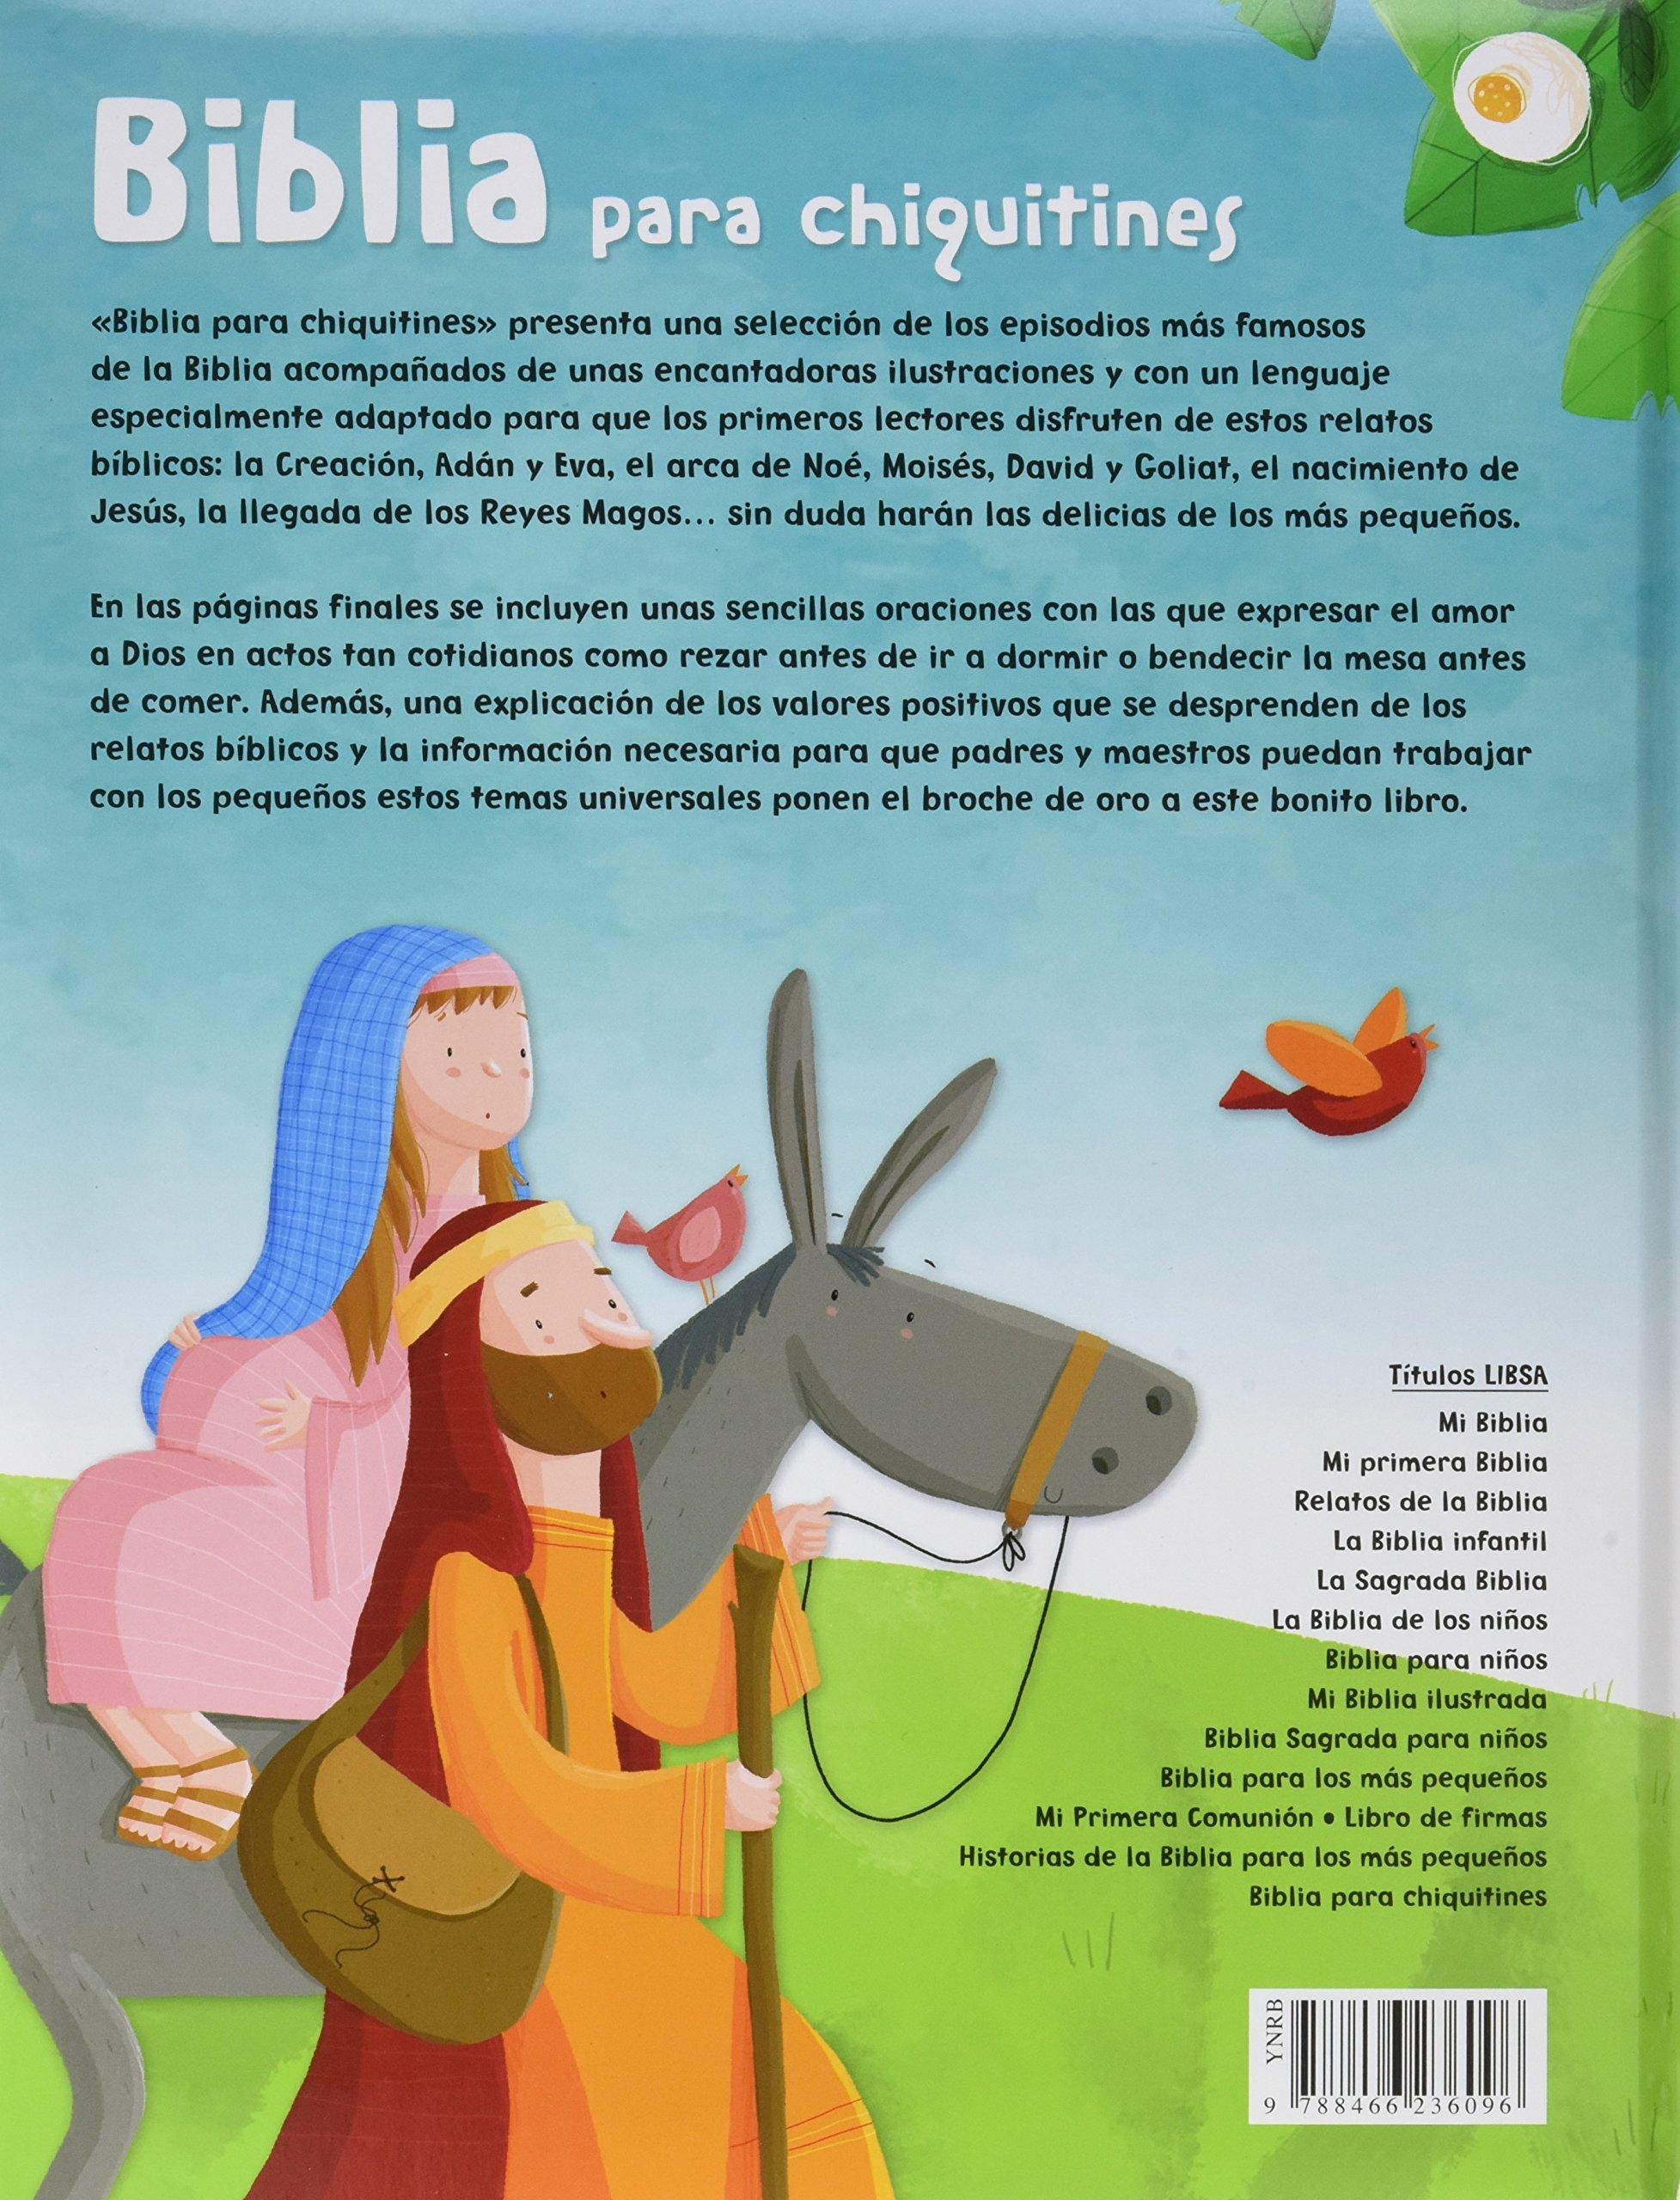 Biblia para Chiquitines (Biblias Infantiles): Amazon.es: Equipo Editorial: Libros